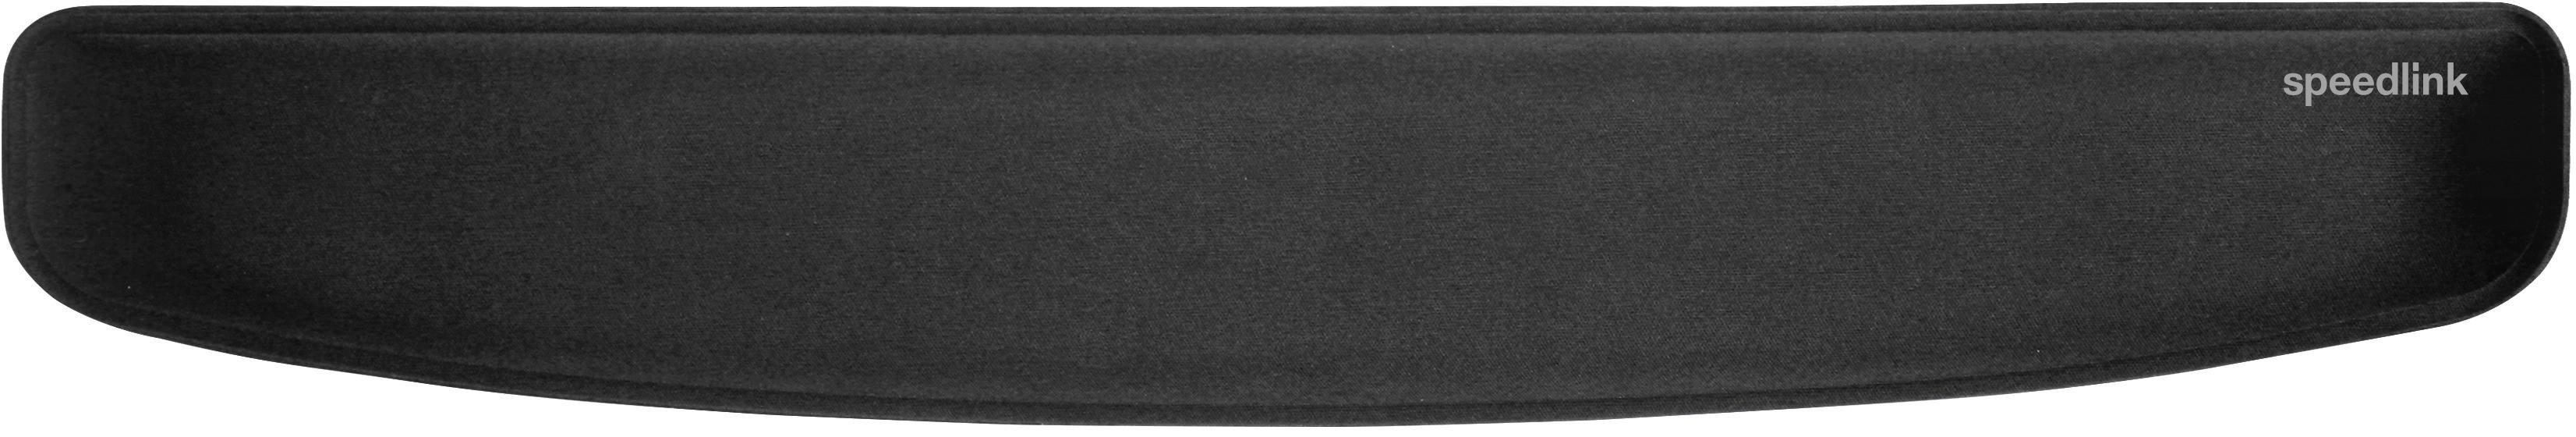 Speedlink randmetugi Sateen (SL-620801-BK)